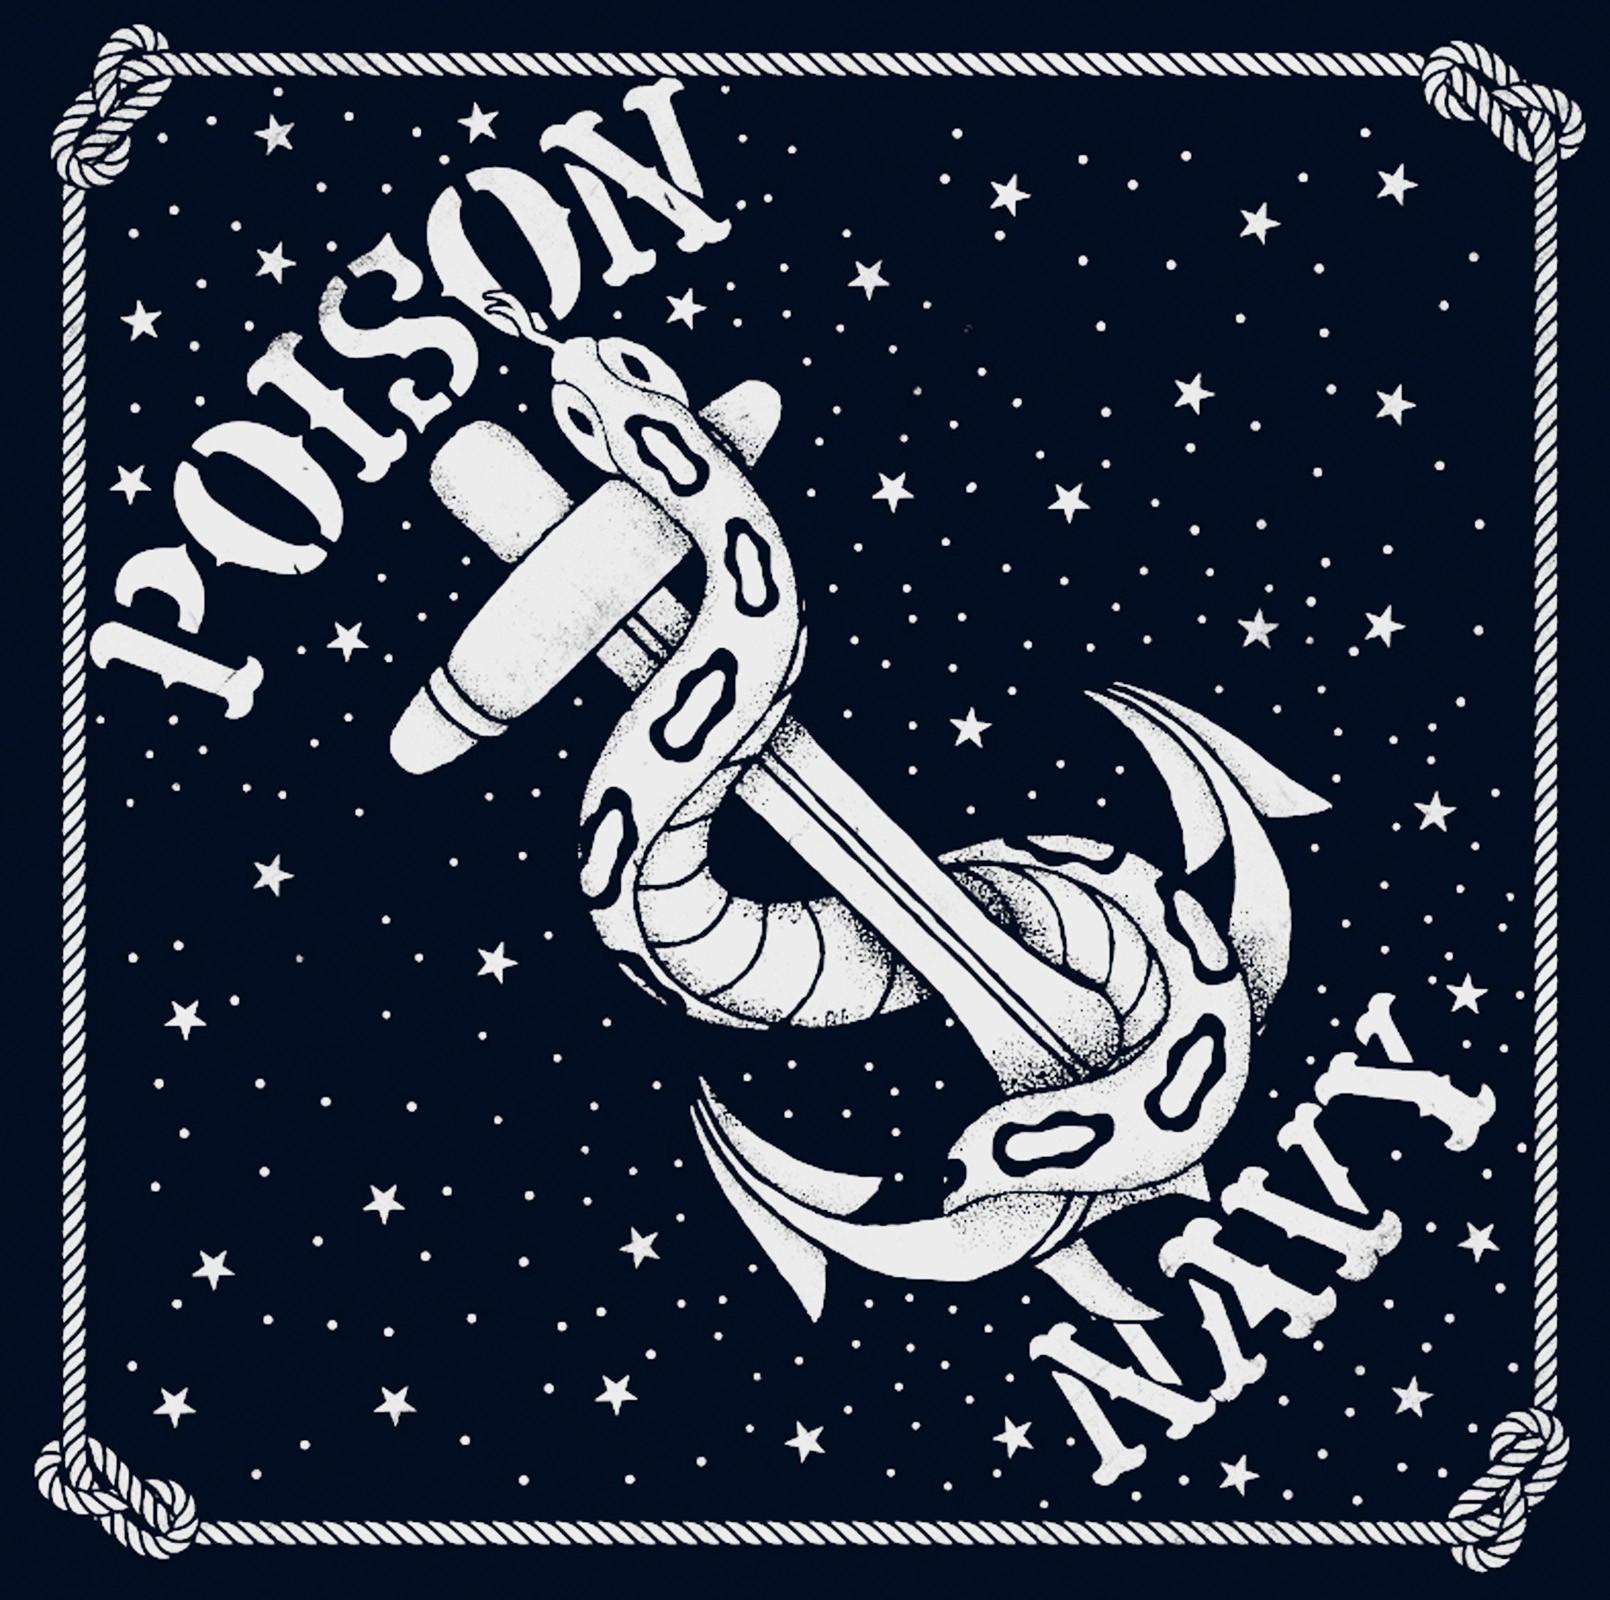 La Marca Del Diablo - Poison Navy Bandana